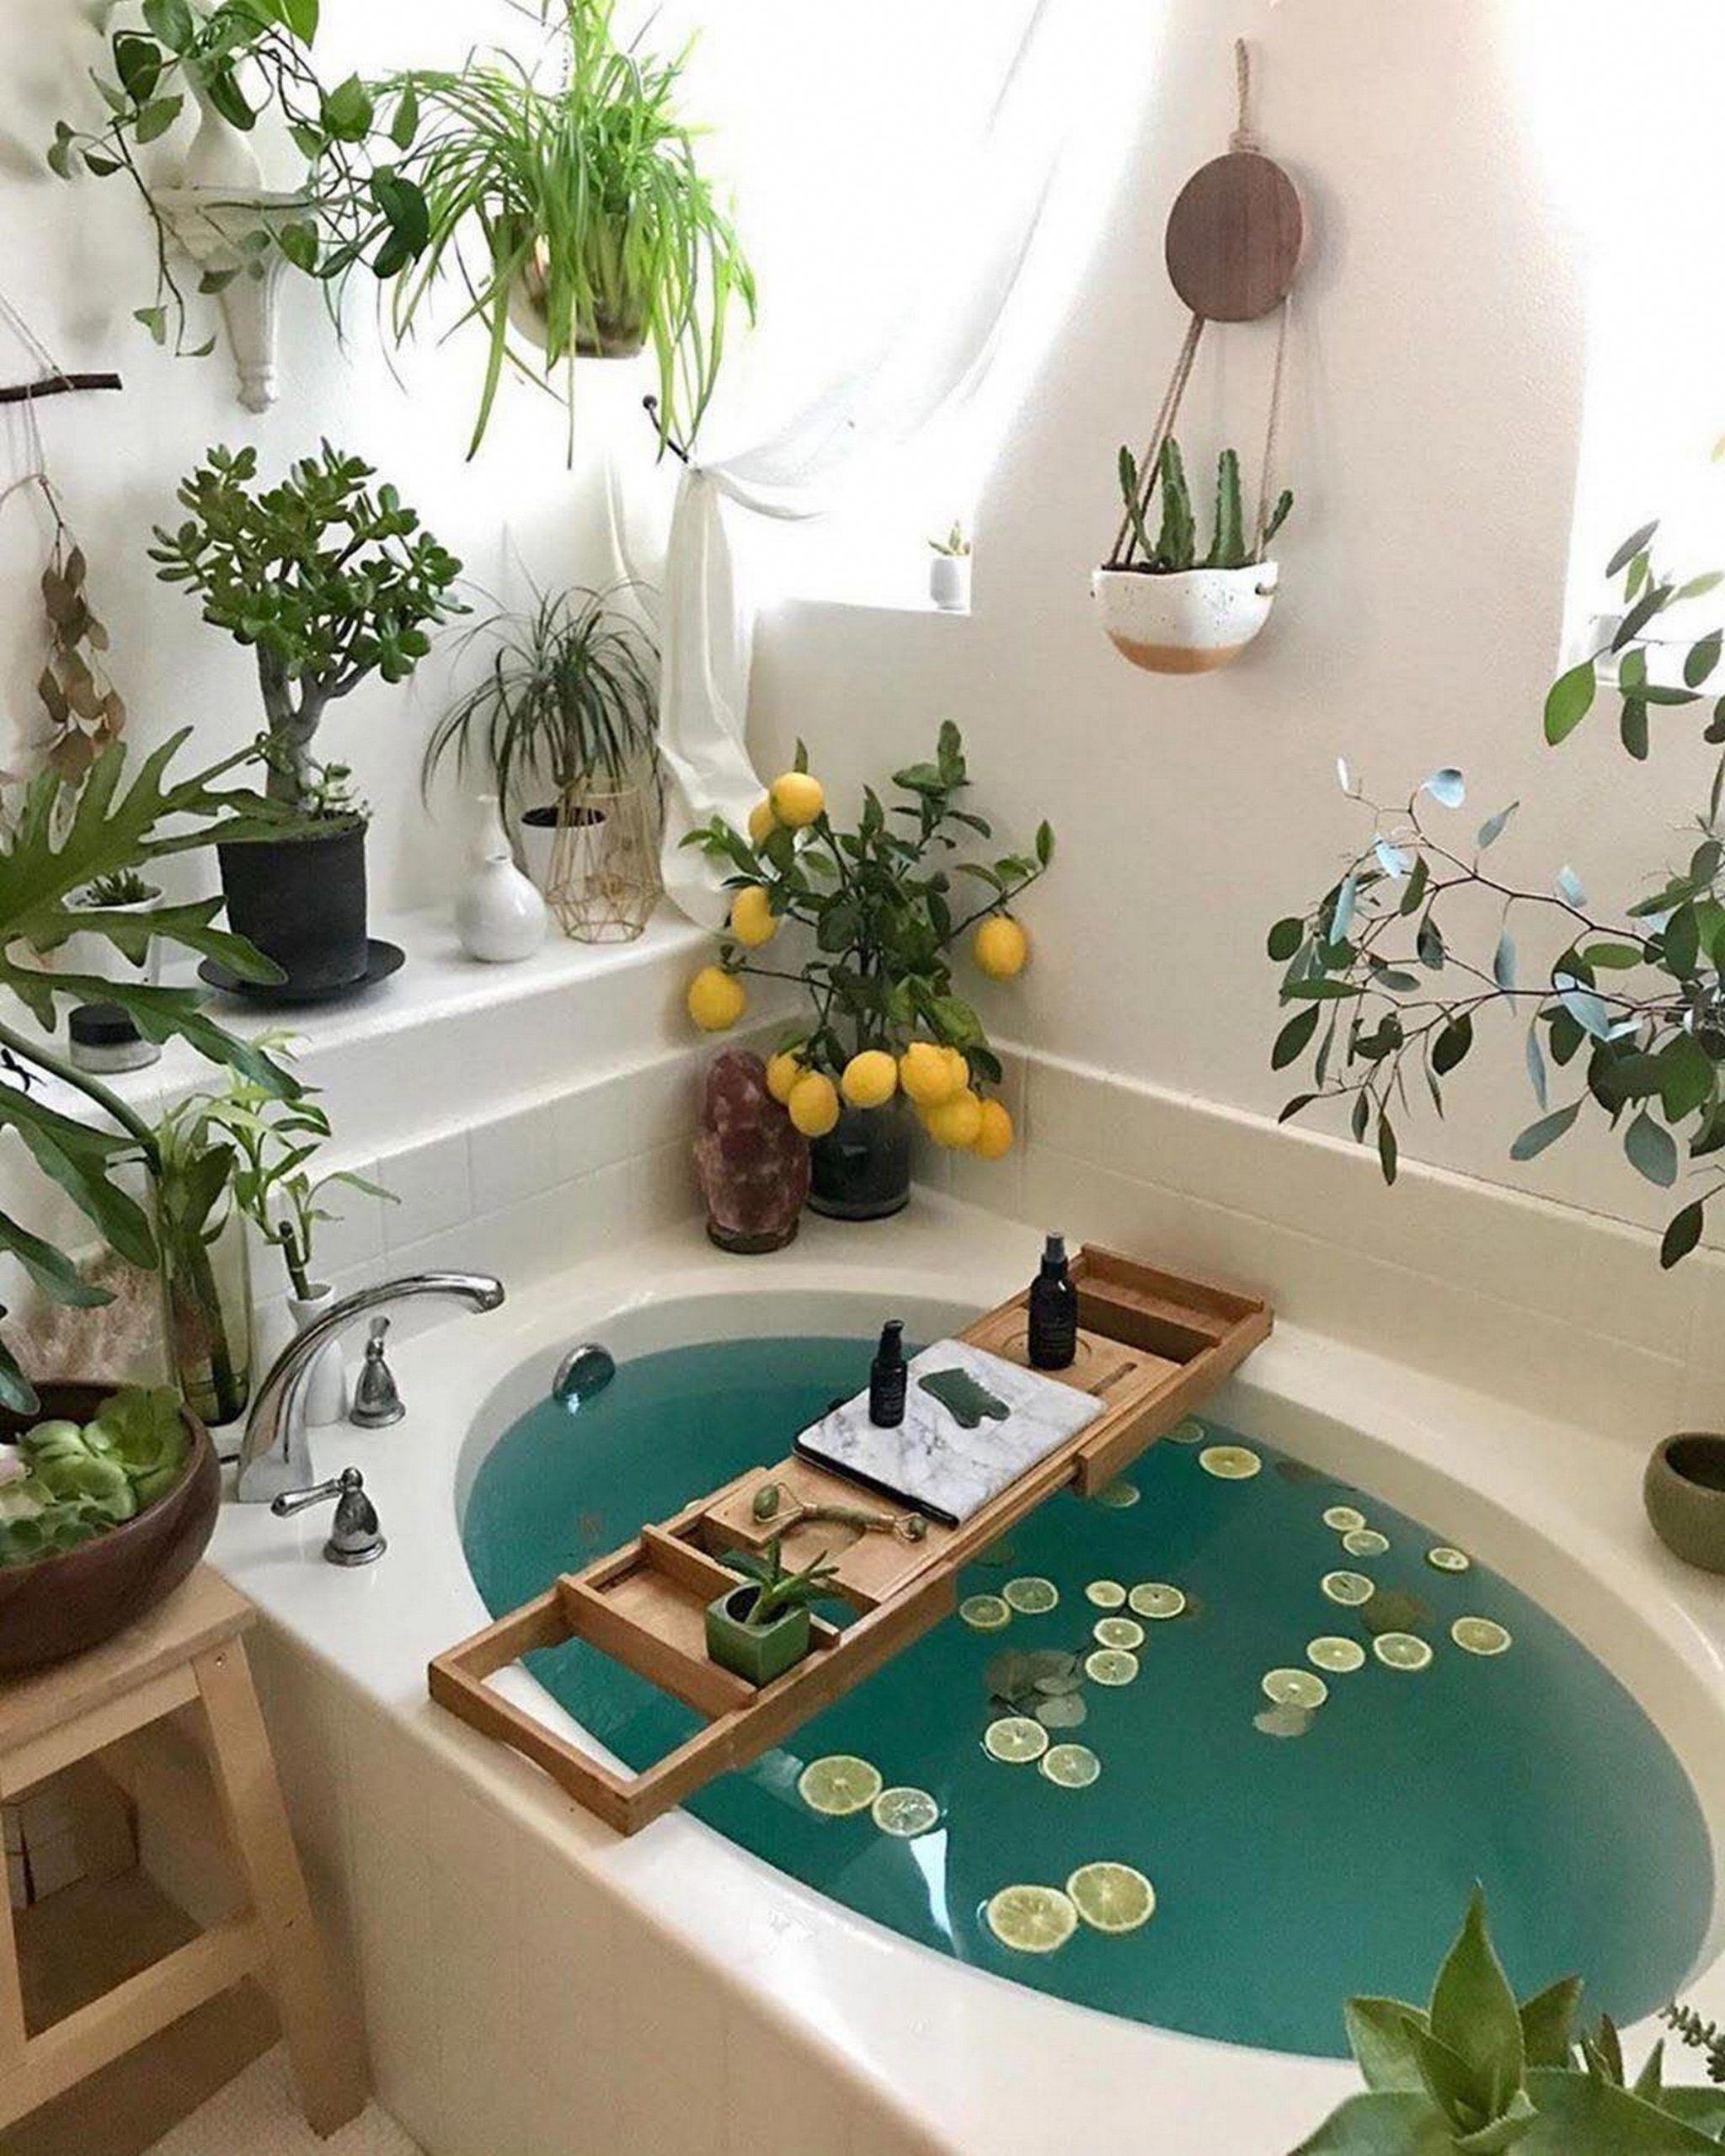 Bohemian Style Home Decor With Latest Design Bohemian Decor Design Home Latest Style Aesthetichomedecor In 2020 Cheap Home Decor Bohemian Bathroom Living Decor